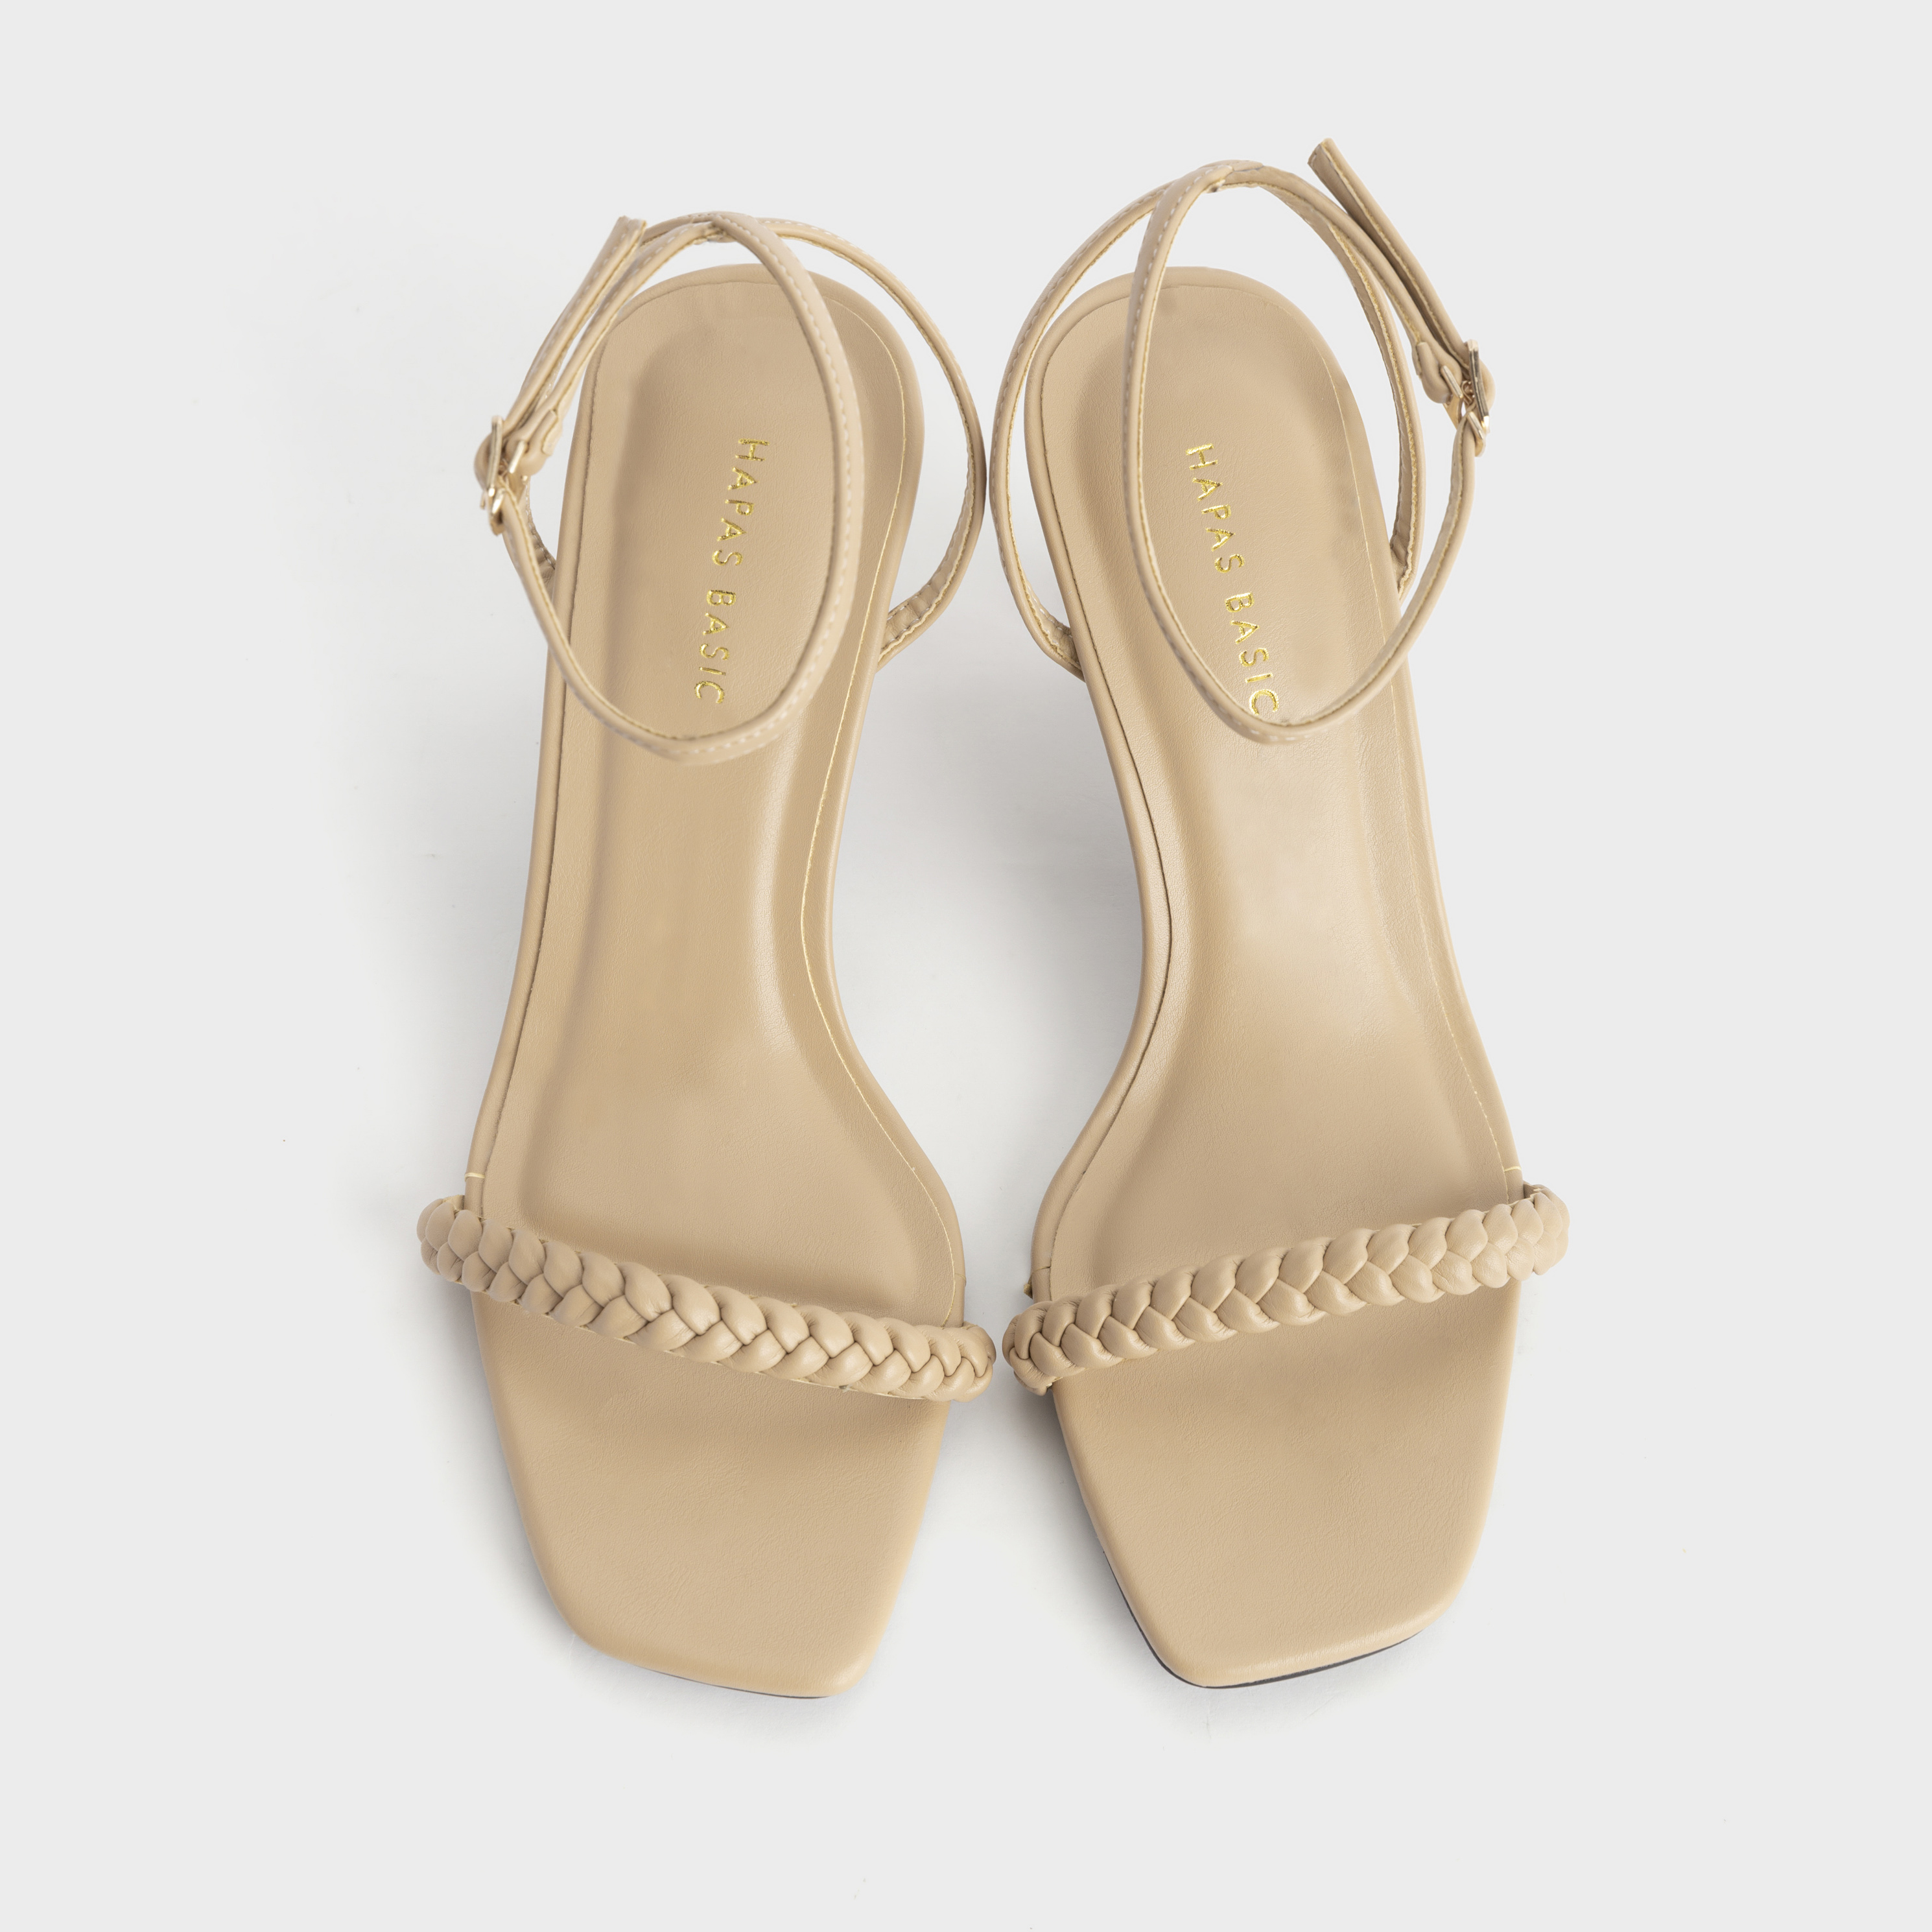 Giày Cao Gót Nữ Quai Tết Gót Nhọn 7Phân HAPAS - CG77113